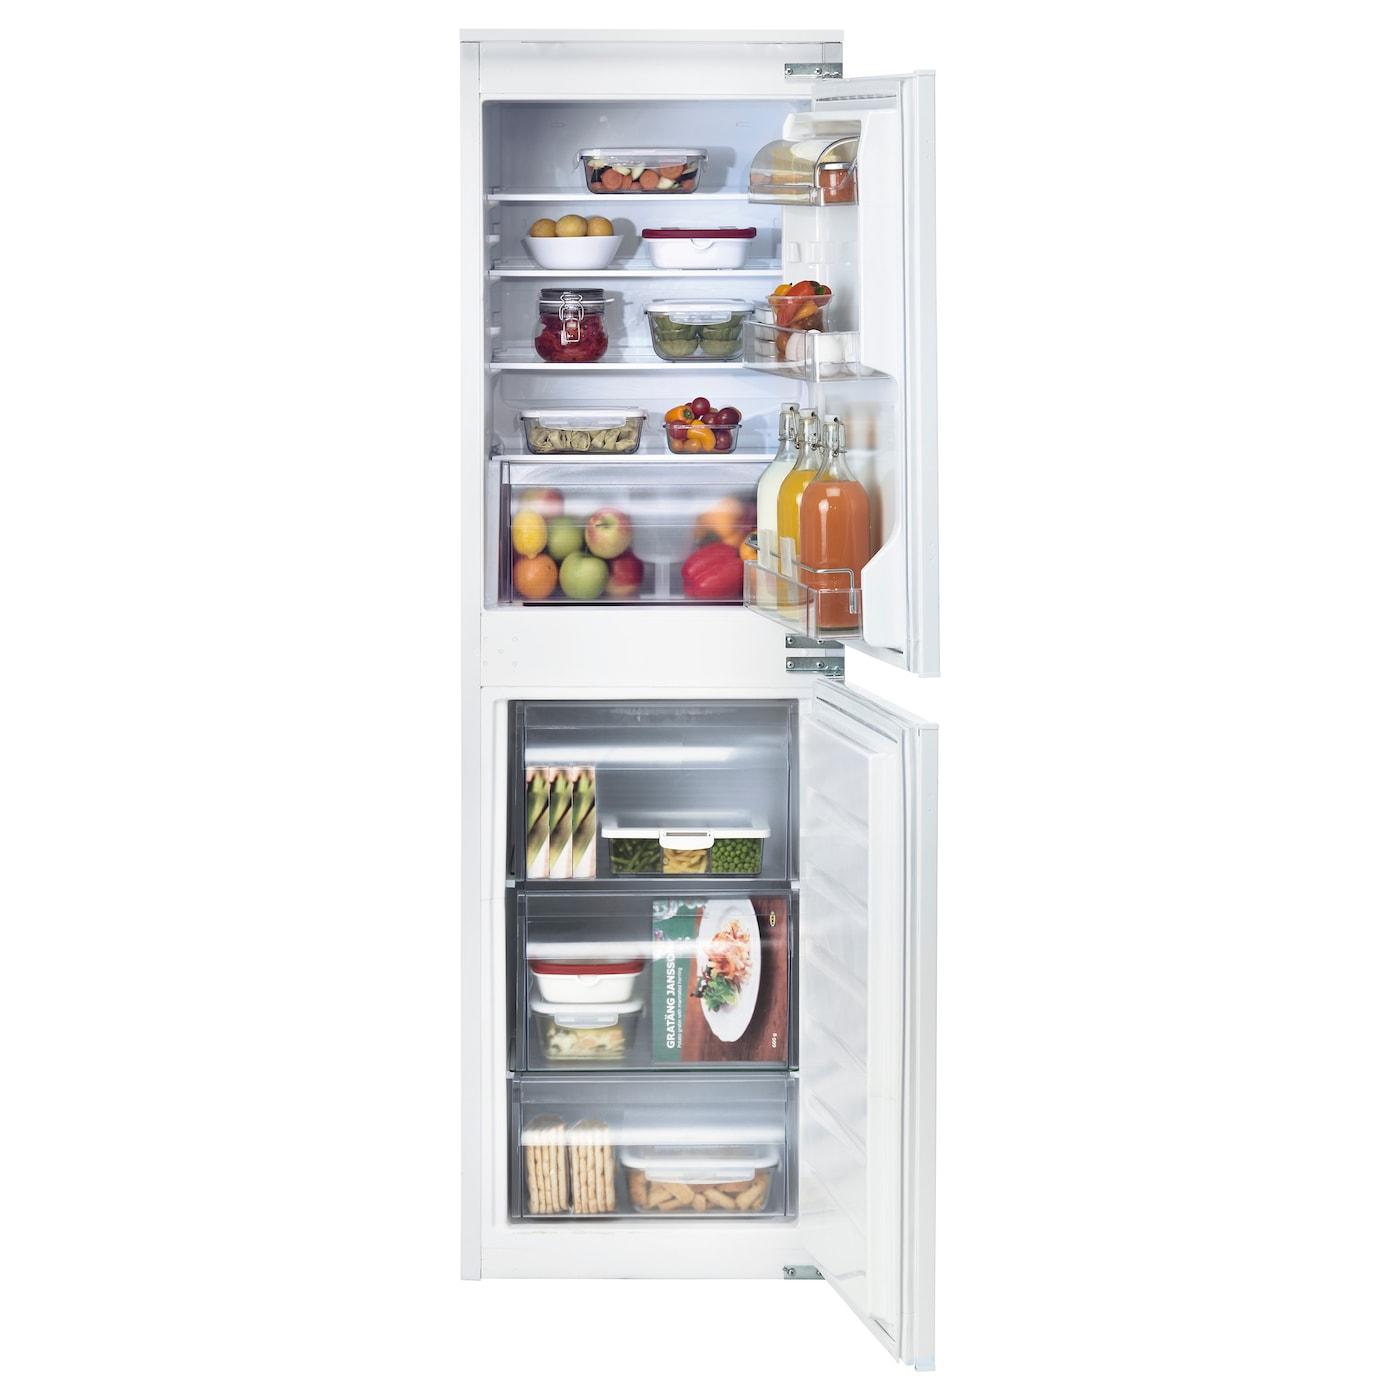 ikea fridges freezers ireland dublin. Black Bedroom Furniture Sets. Home Design Ideas